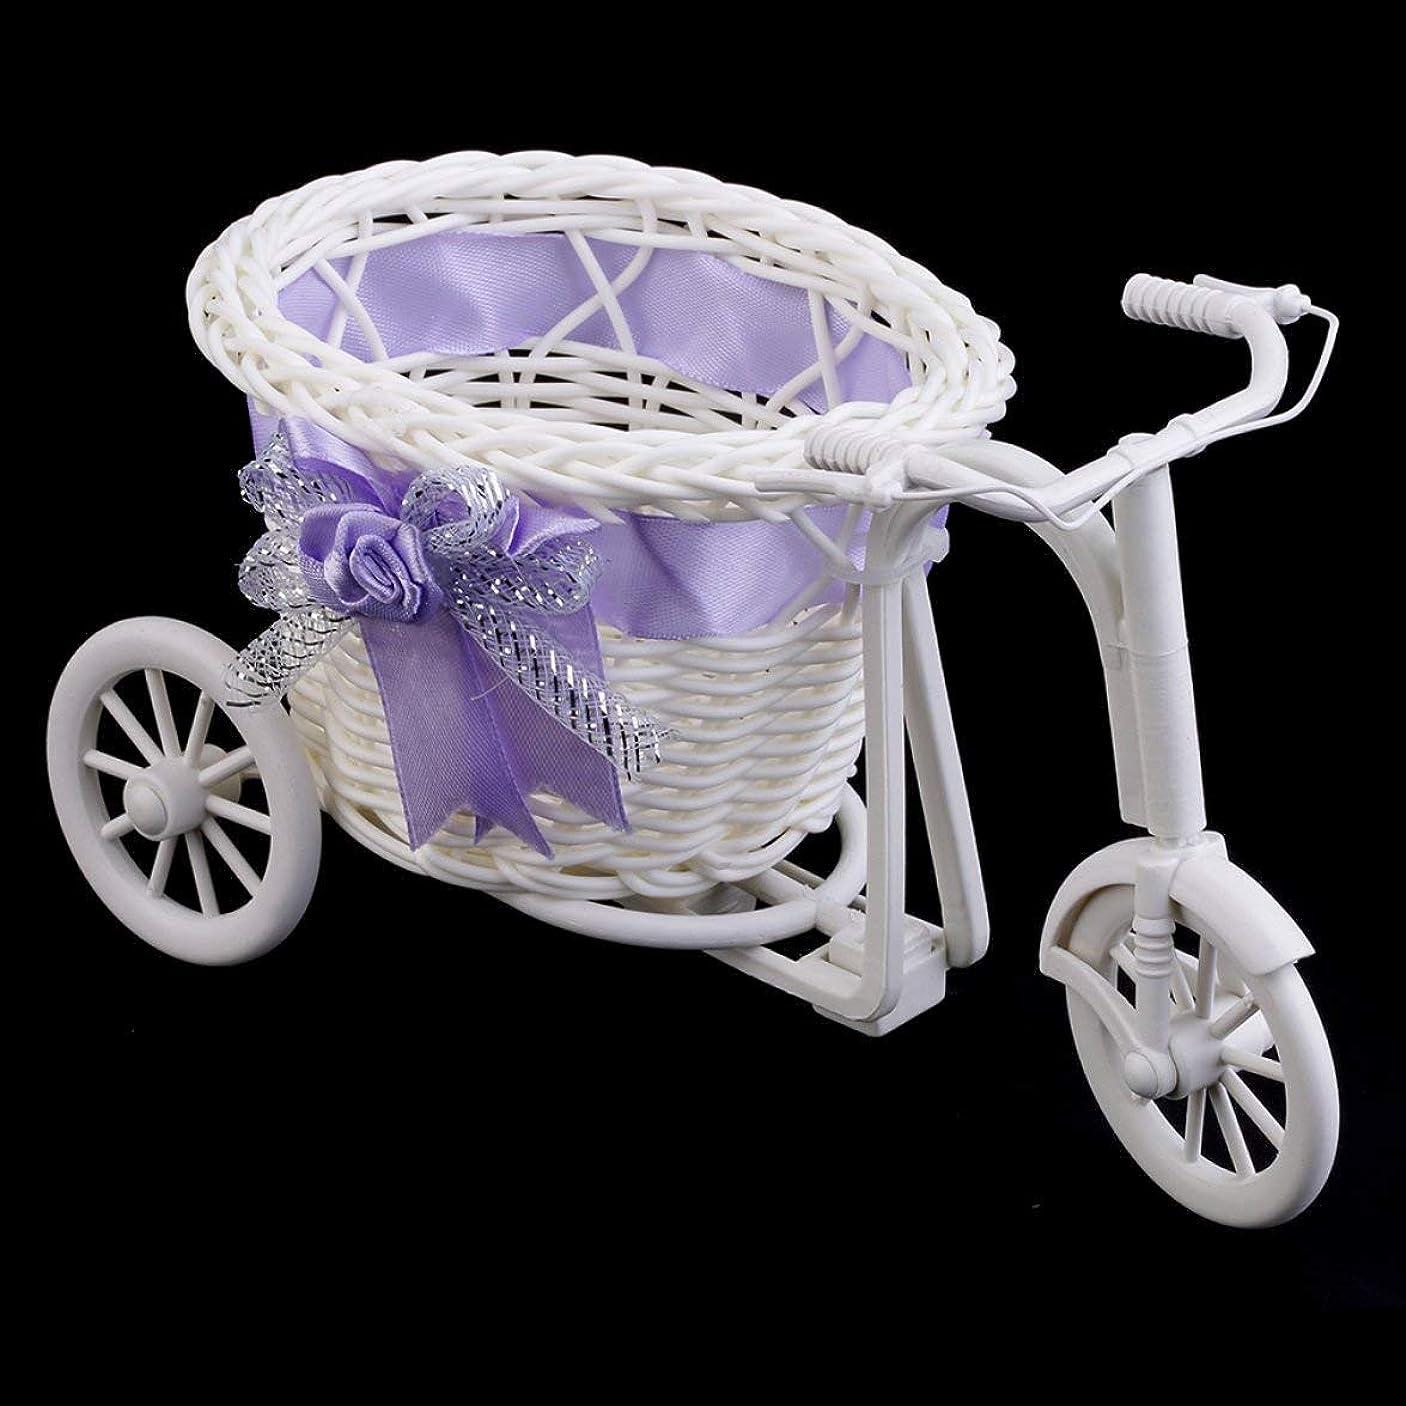 Tivollyff 籐三輪車自転車フラワーバスケットガーデンウェディングパーティーの装飾ミニユーティリティカートの贈り物としてプラスチックオフィスの寝室